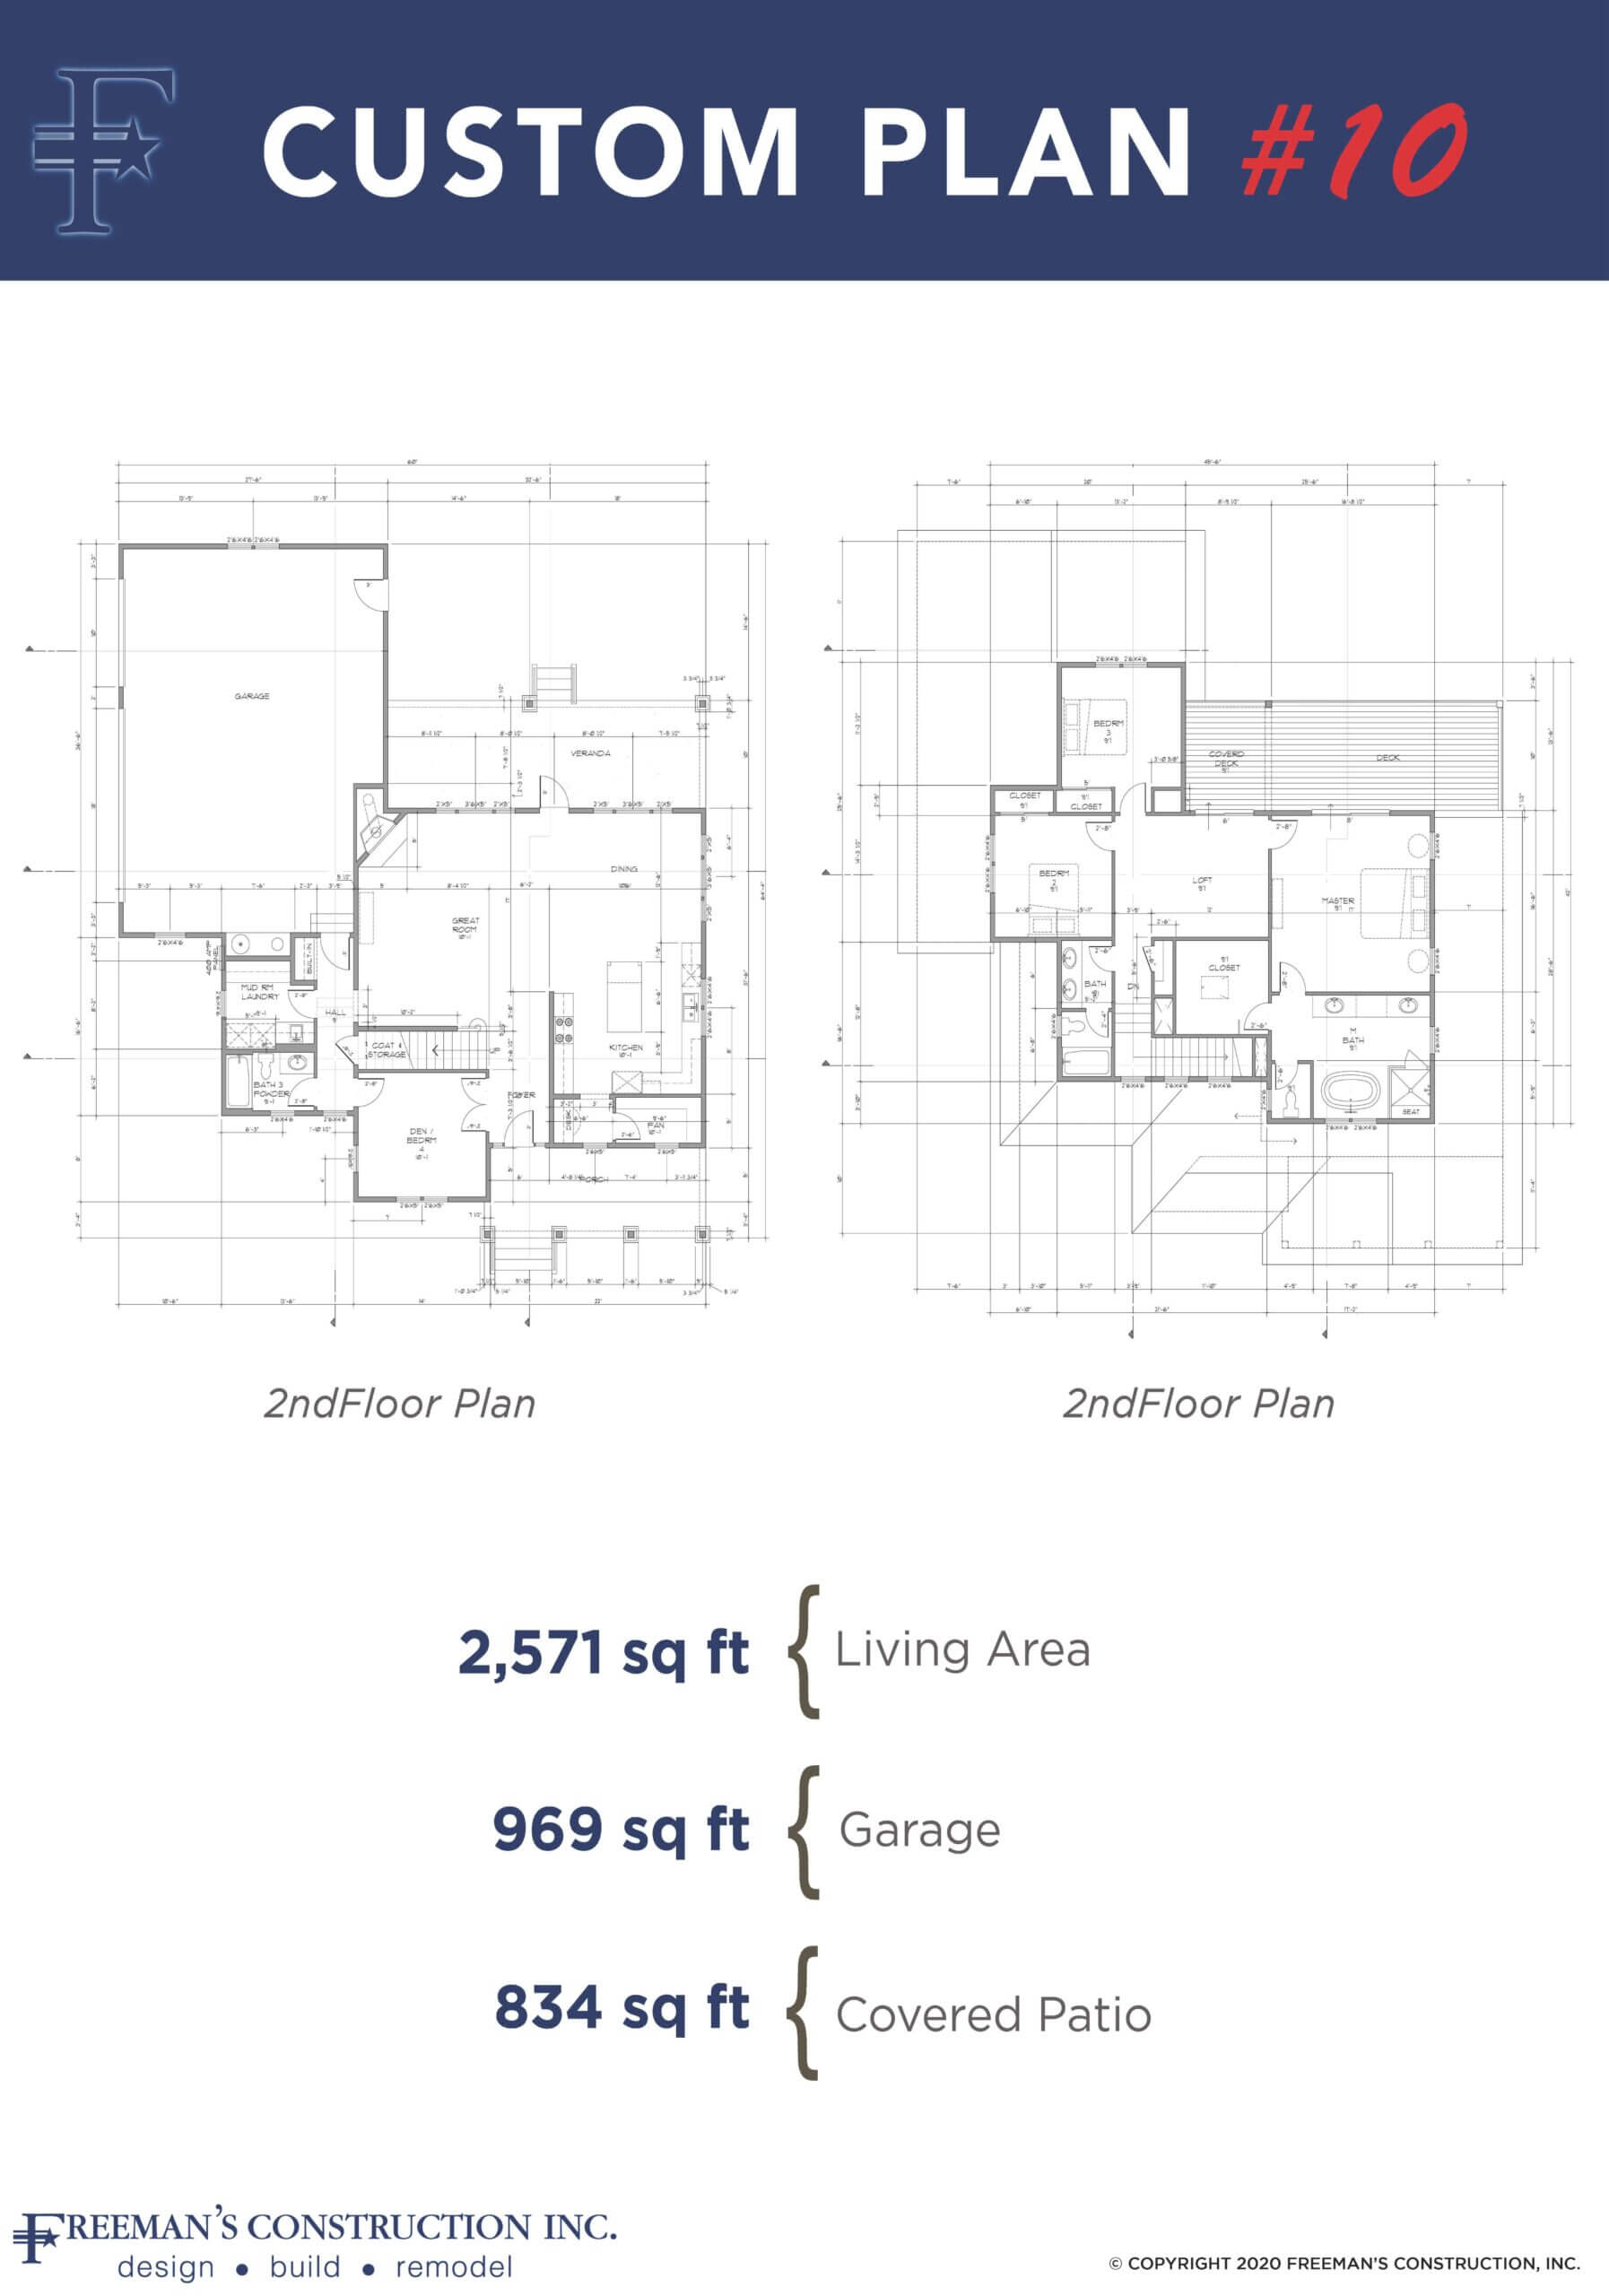 custom-home-floor-plan-10-in-san-diego-county-by-freemans-construction-inc